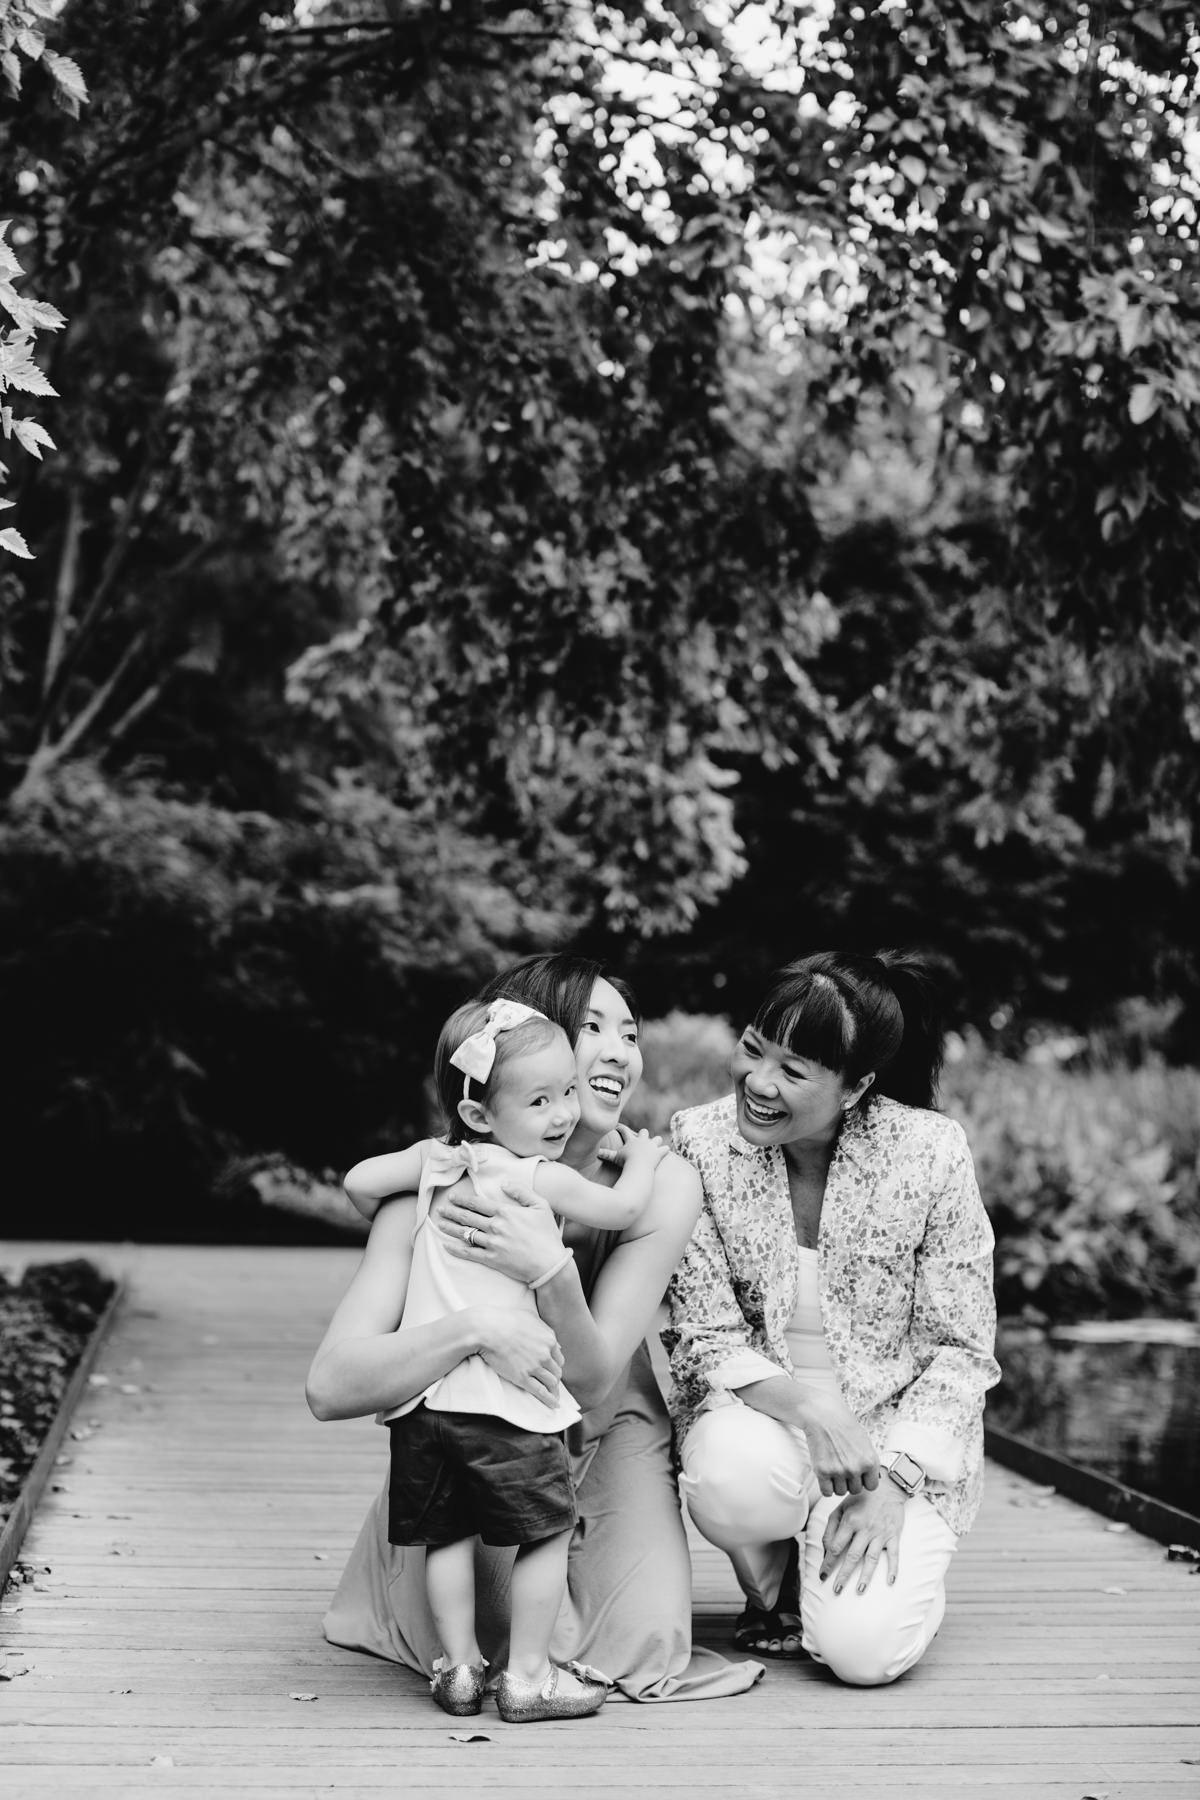 generational-mom-and-daughter-photos-okc.JPG